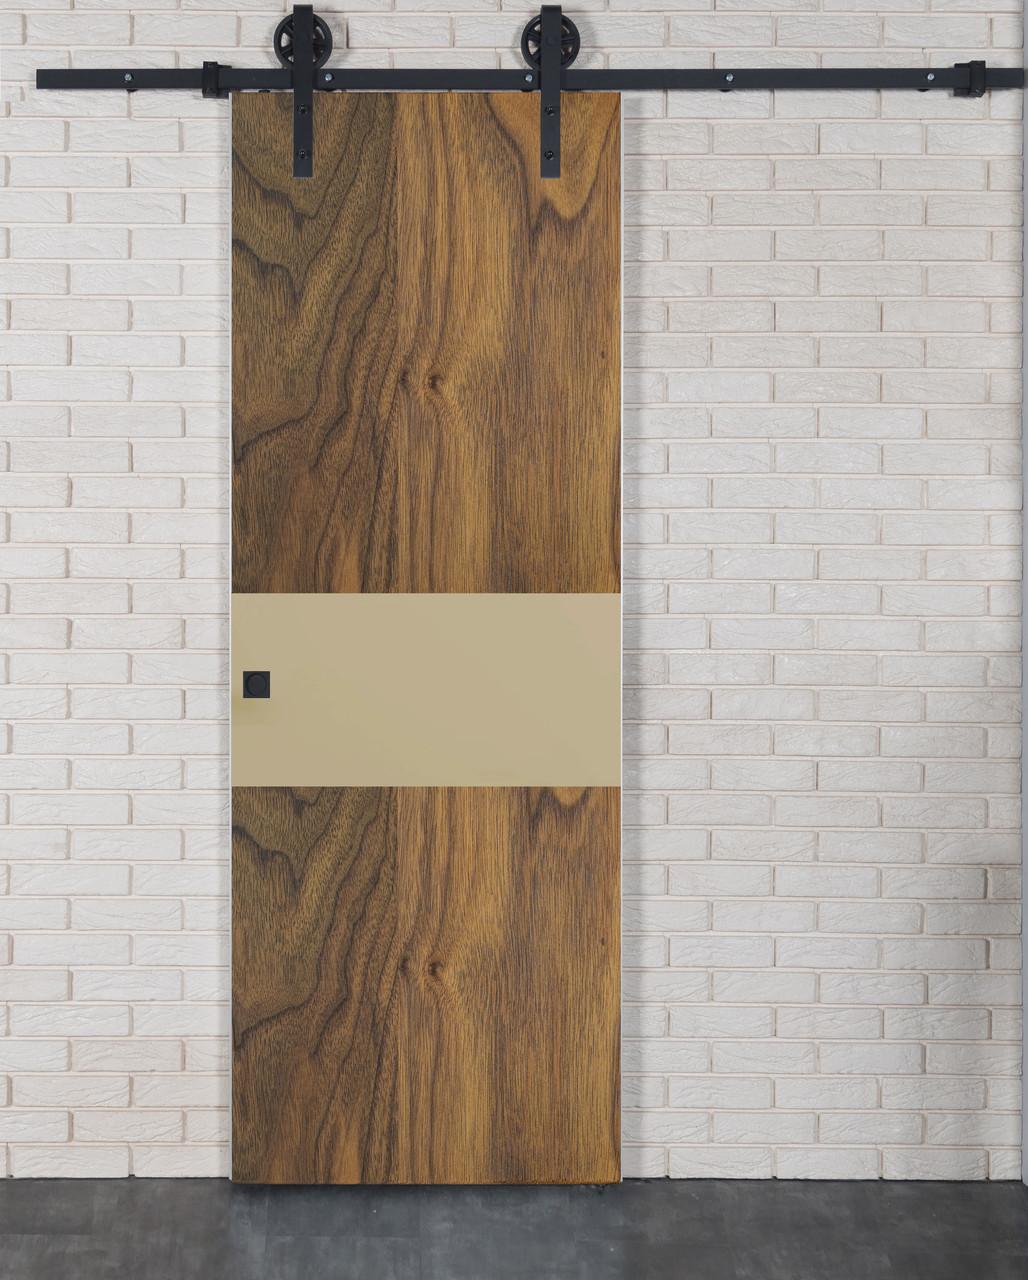 Межкомнатная дверь Флеш-Арт-HPL пластик американский орех